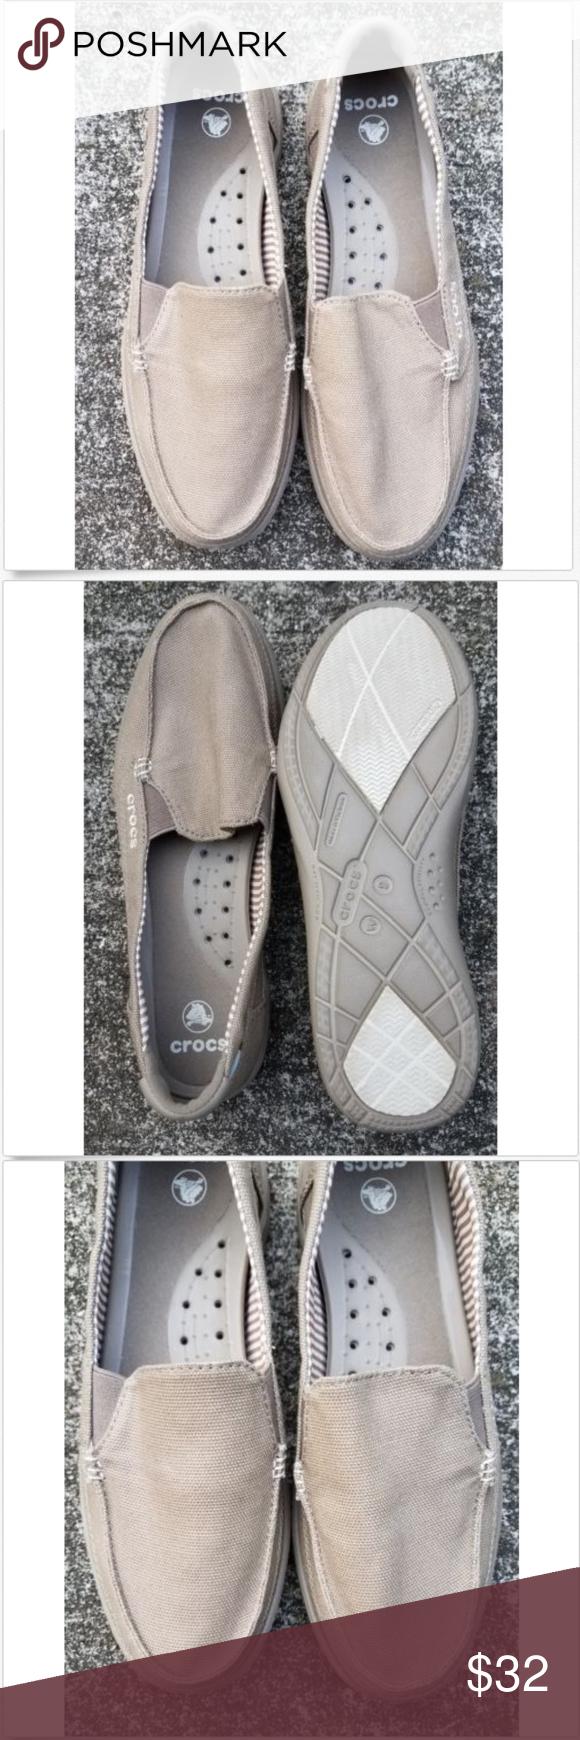 c3988497f7e9 CROCS canvas women shoes size 9 CROCS 14391 walu canvas slip on women shoes  size 9 color Khaki crocs Shoes